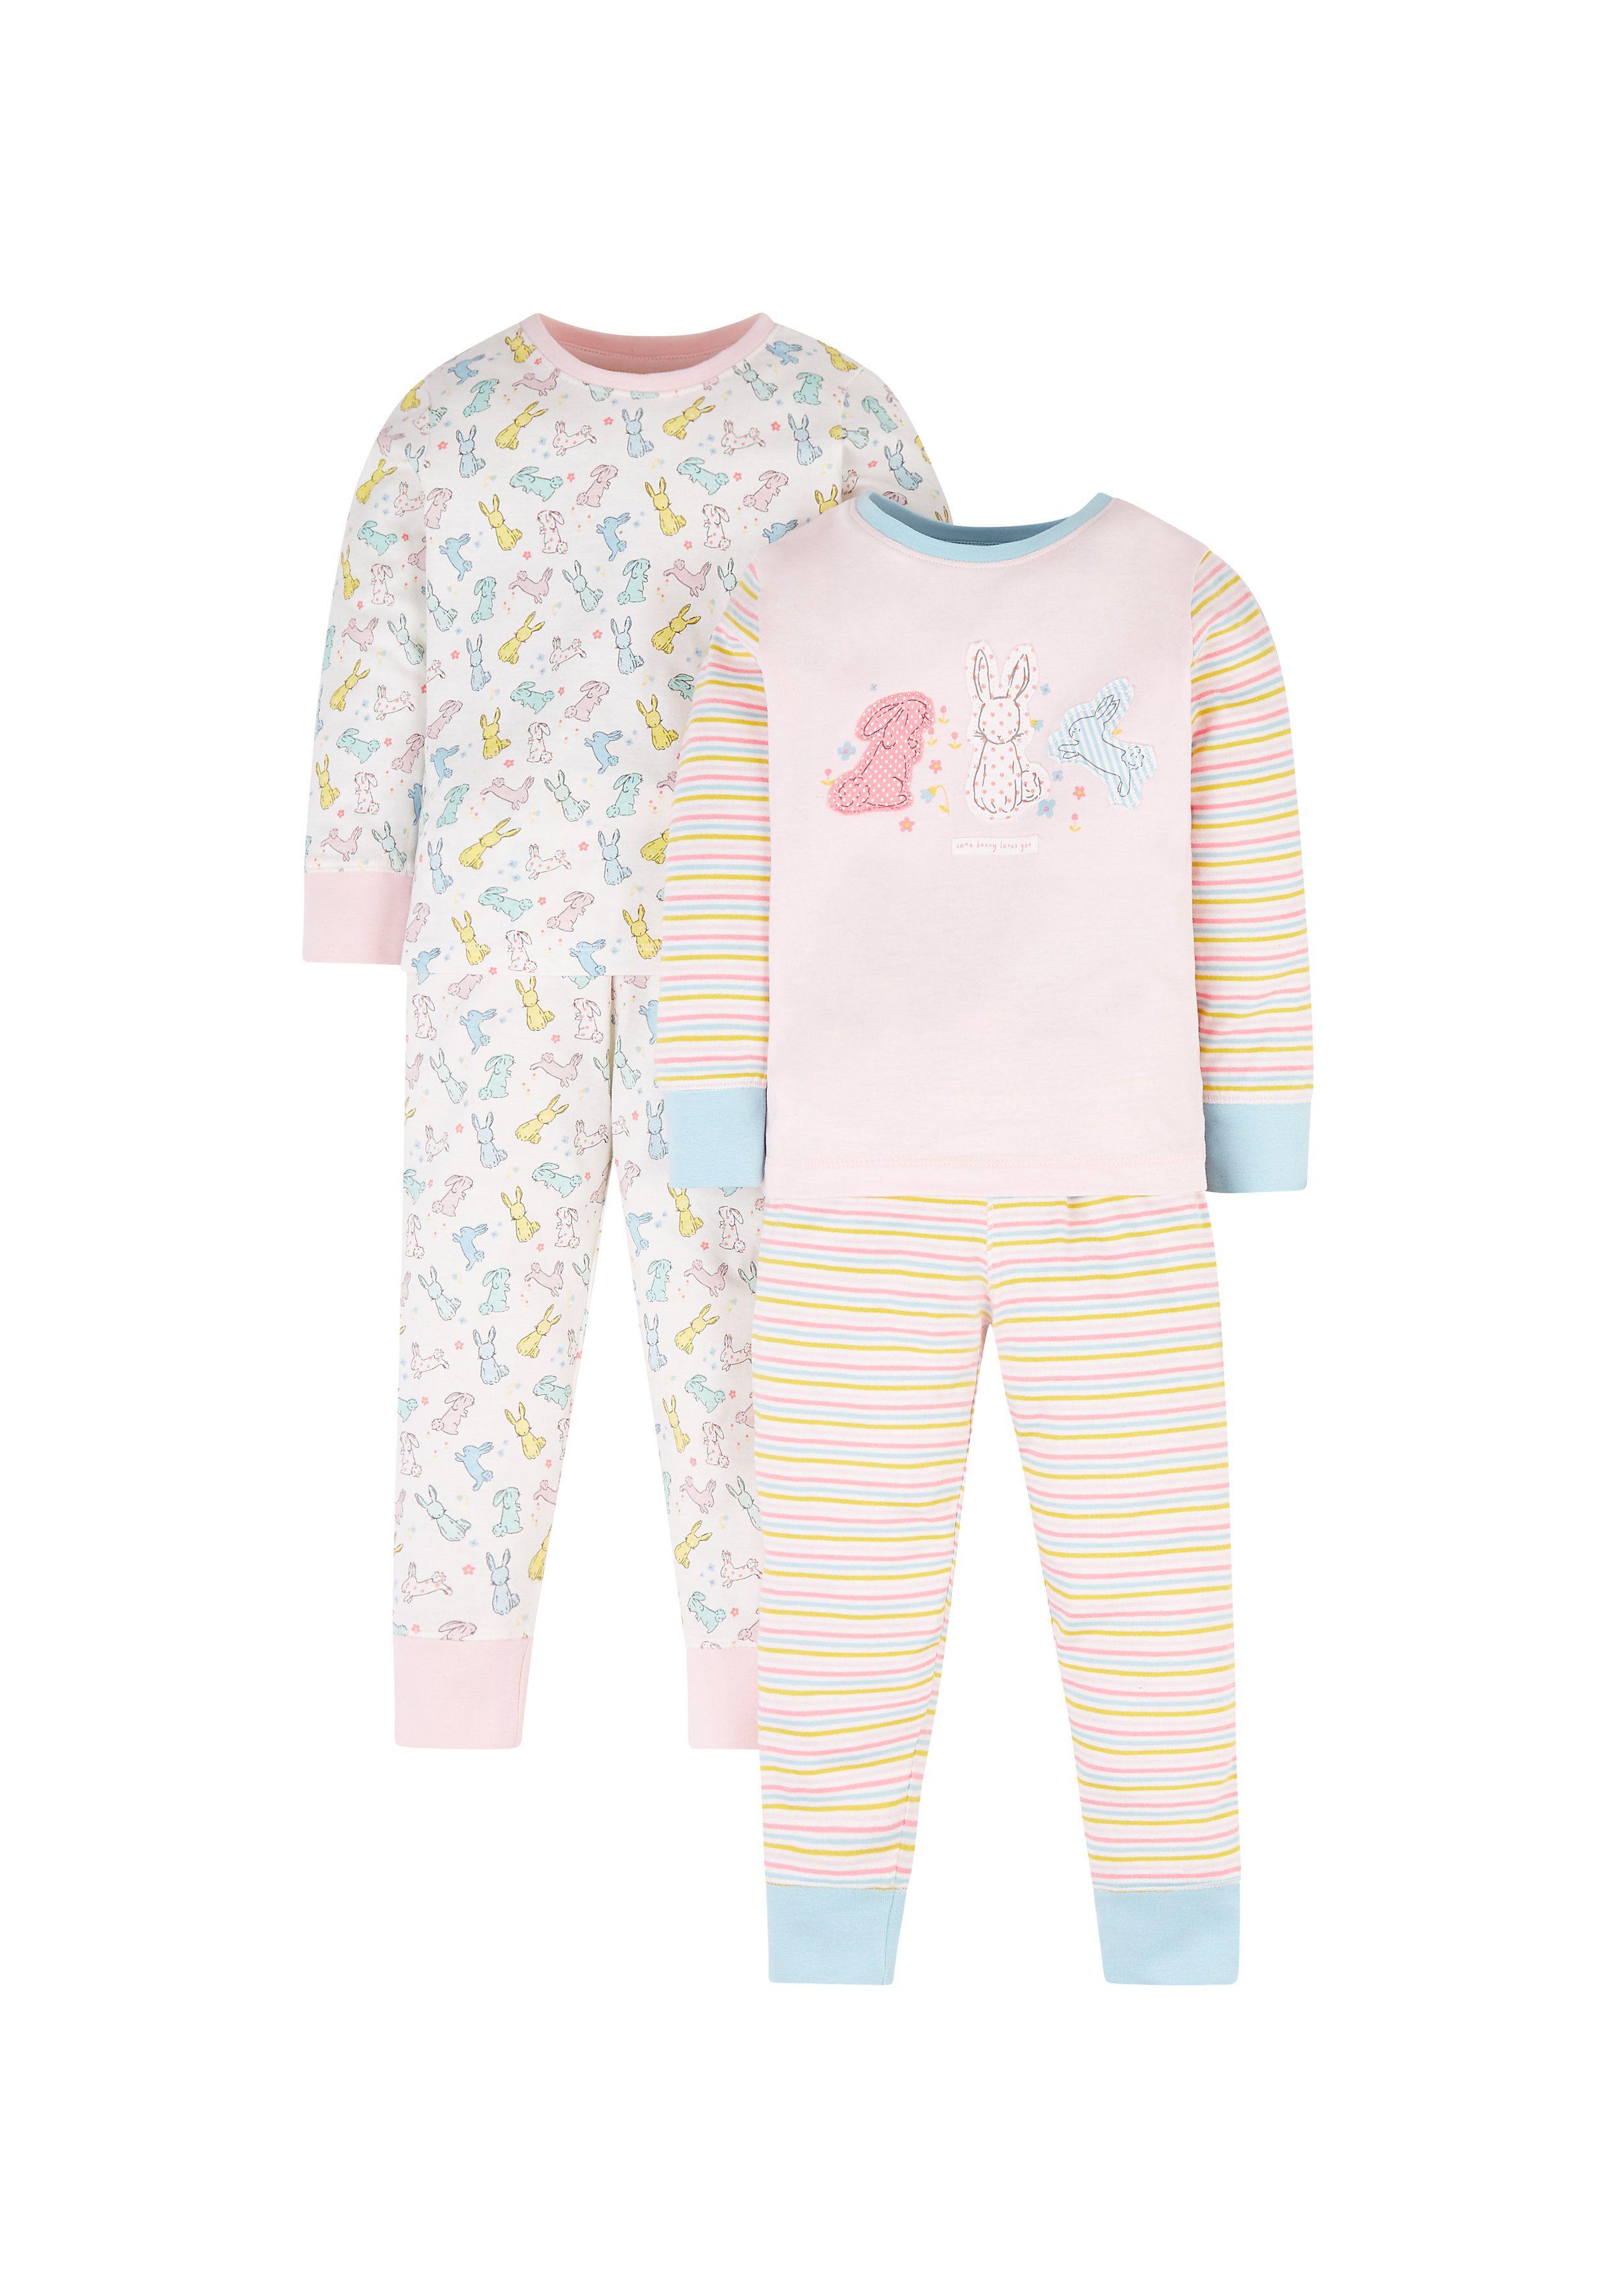 Mothercare   White and Peach Printed Sleepwear Pyjamas - Pack of 2